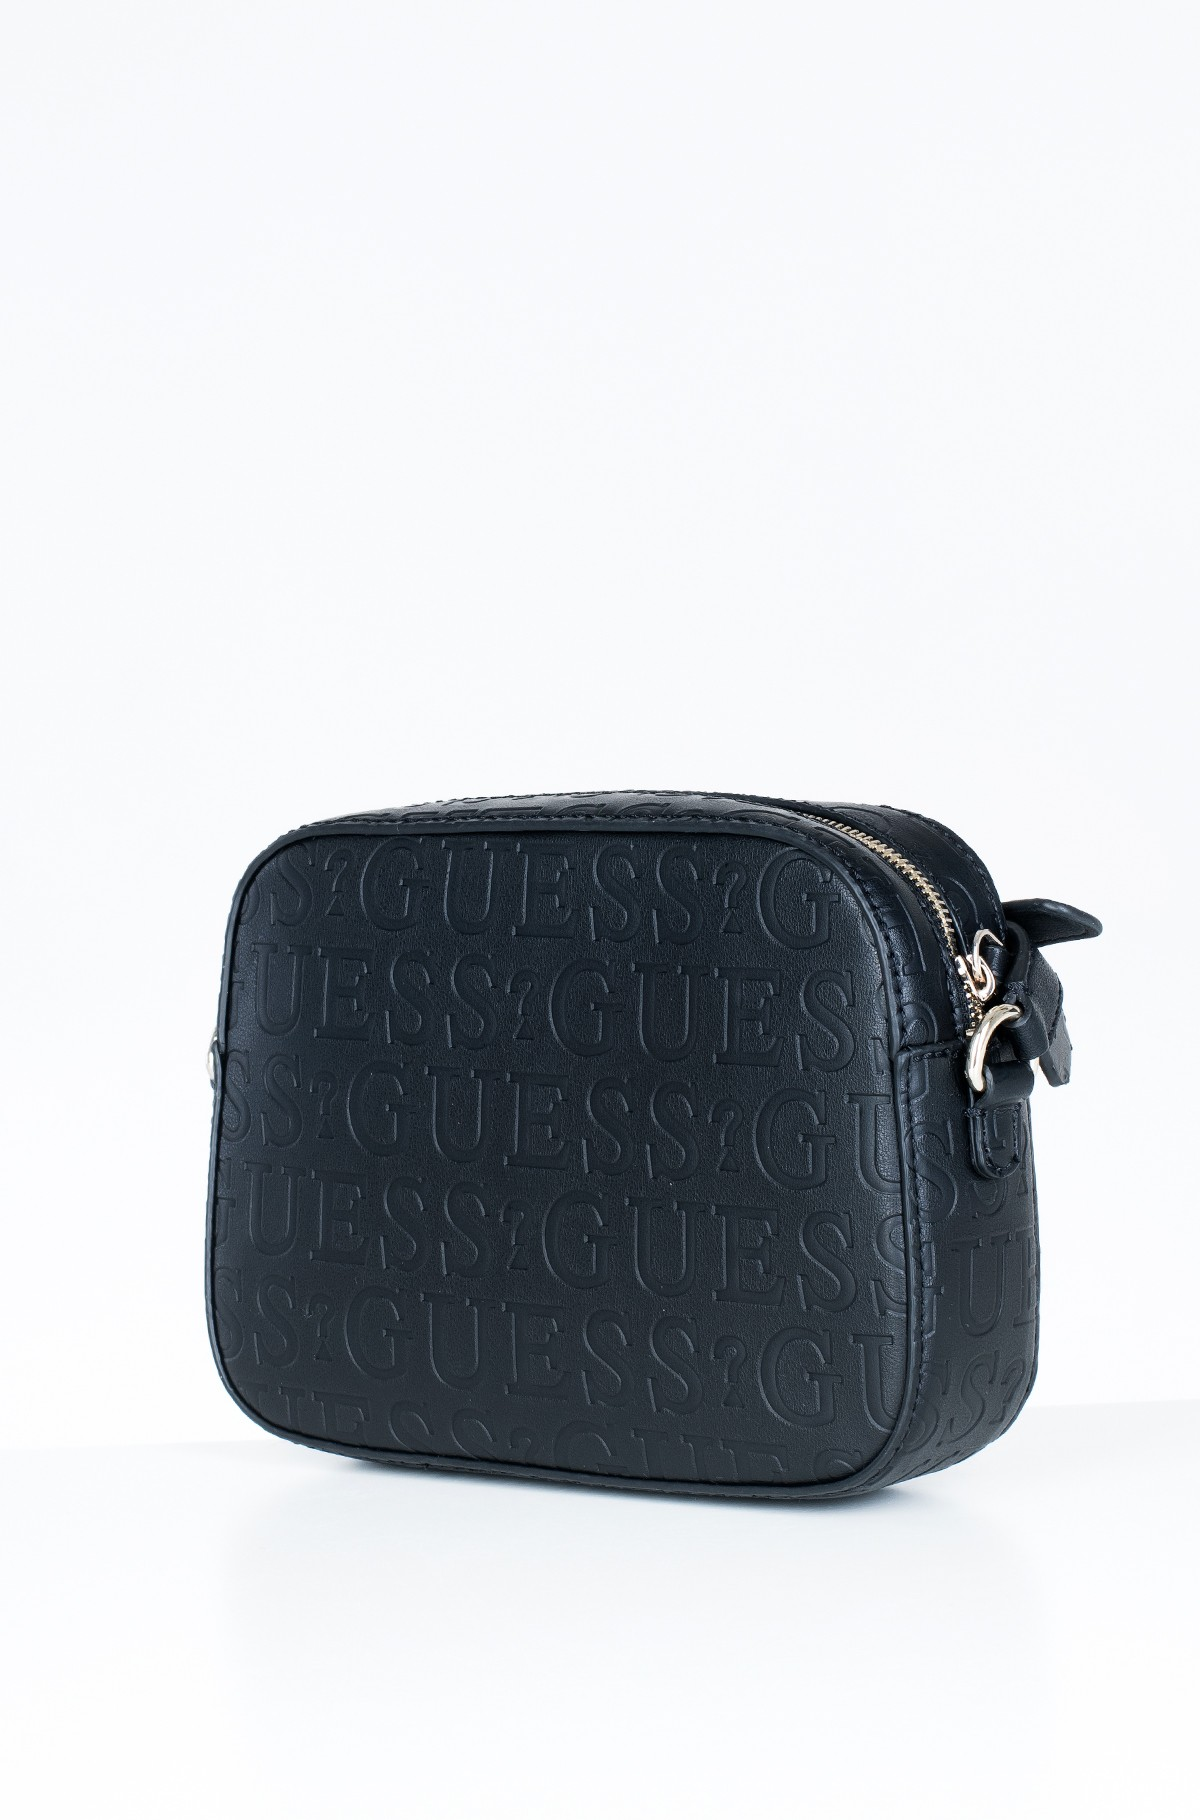 Shoulder bag HWVD66 91120-full-2